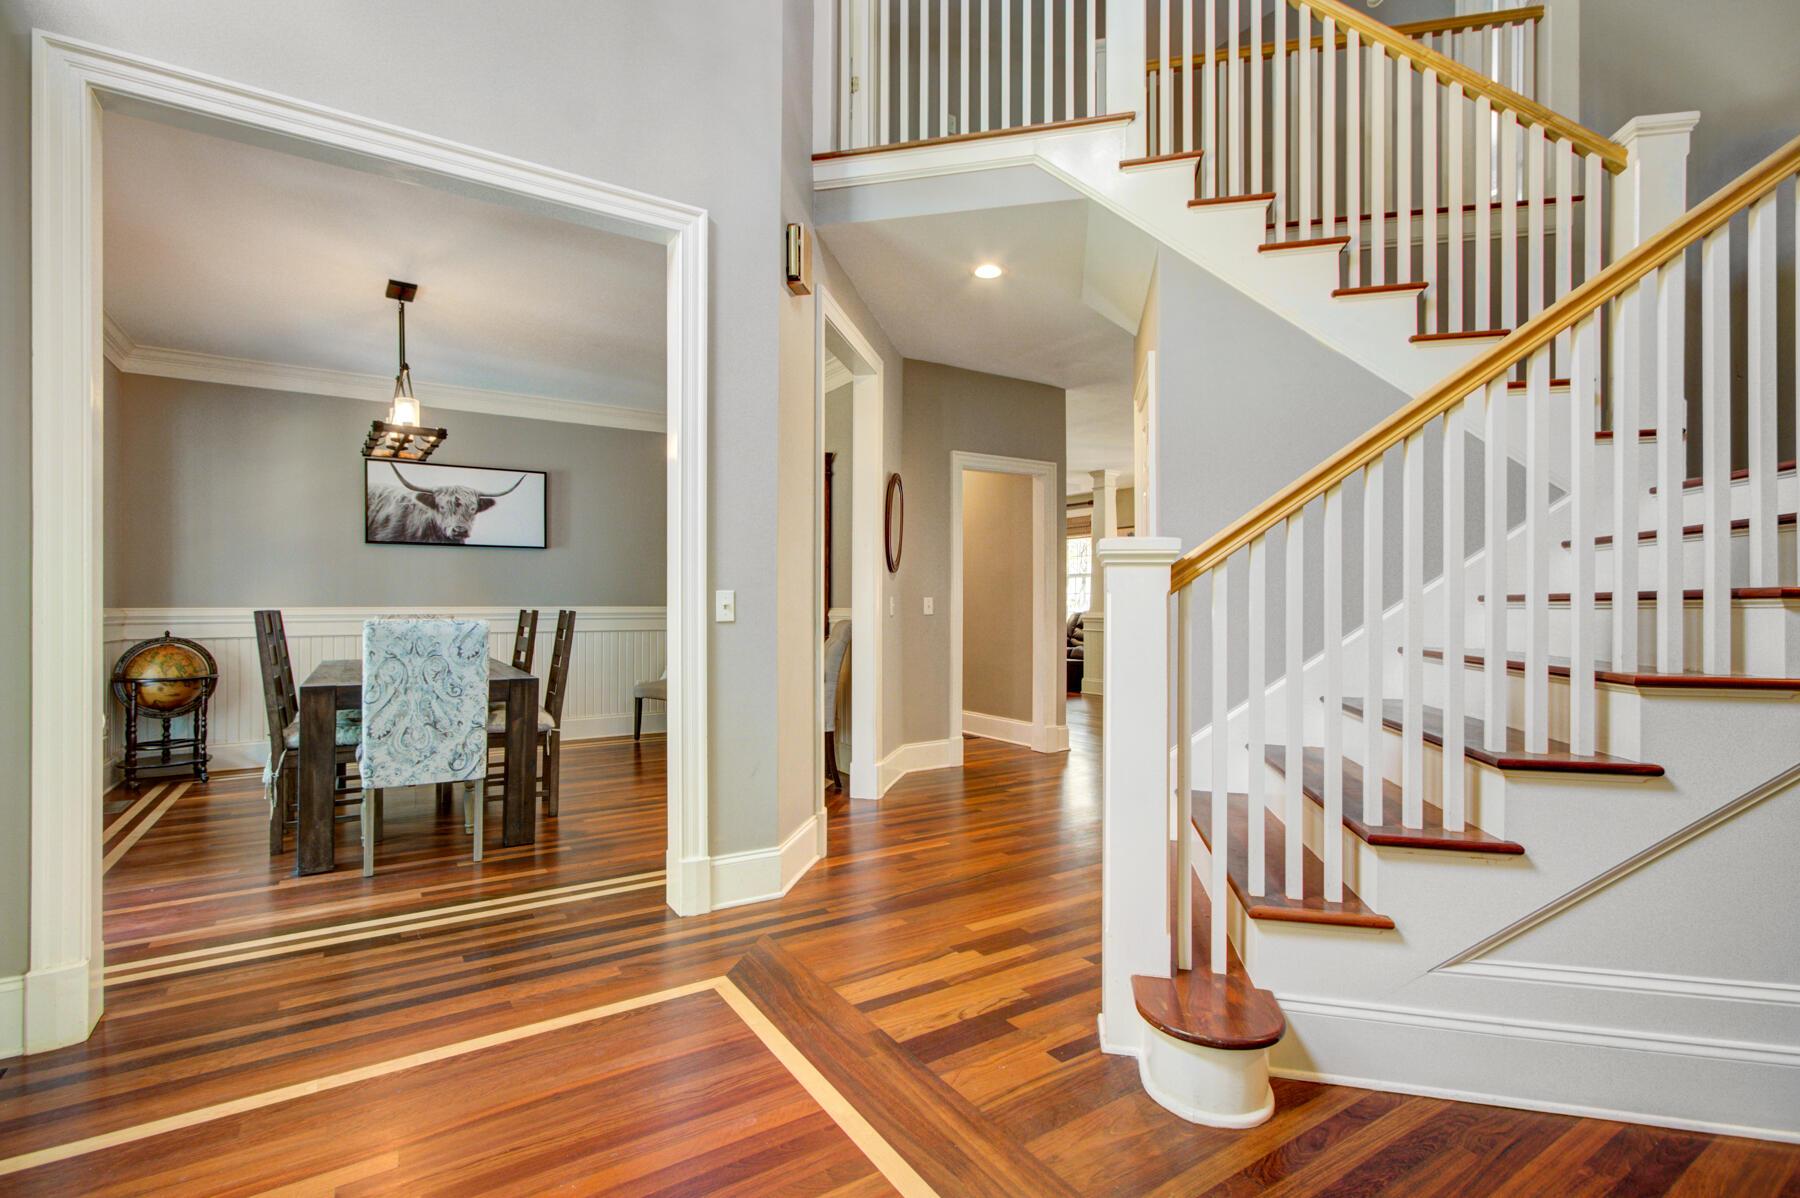 Dunes West Homes For Sale - 3095 Pignatelli, Mount Pleasant, SC - 31